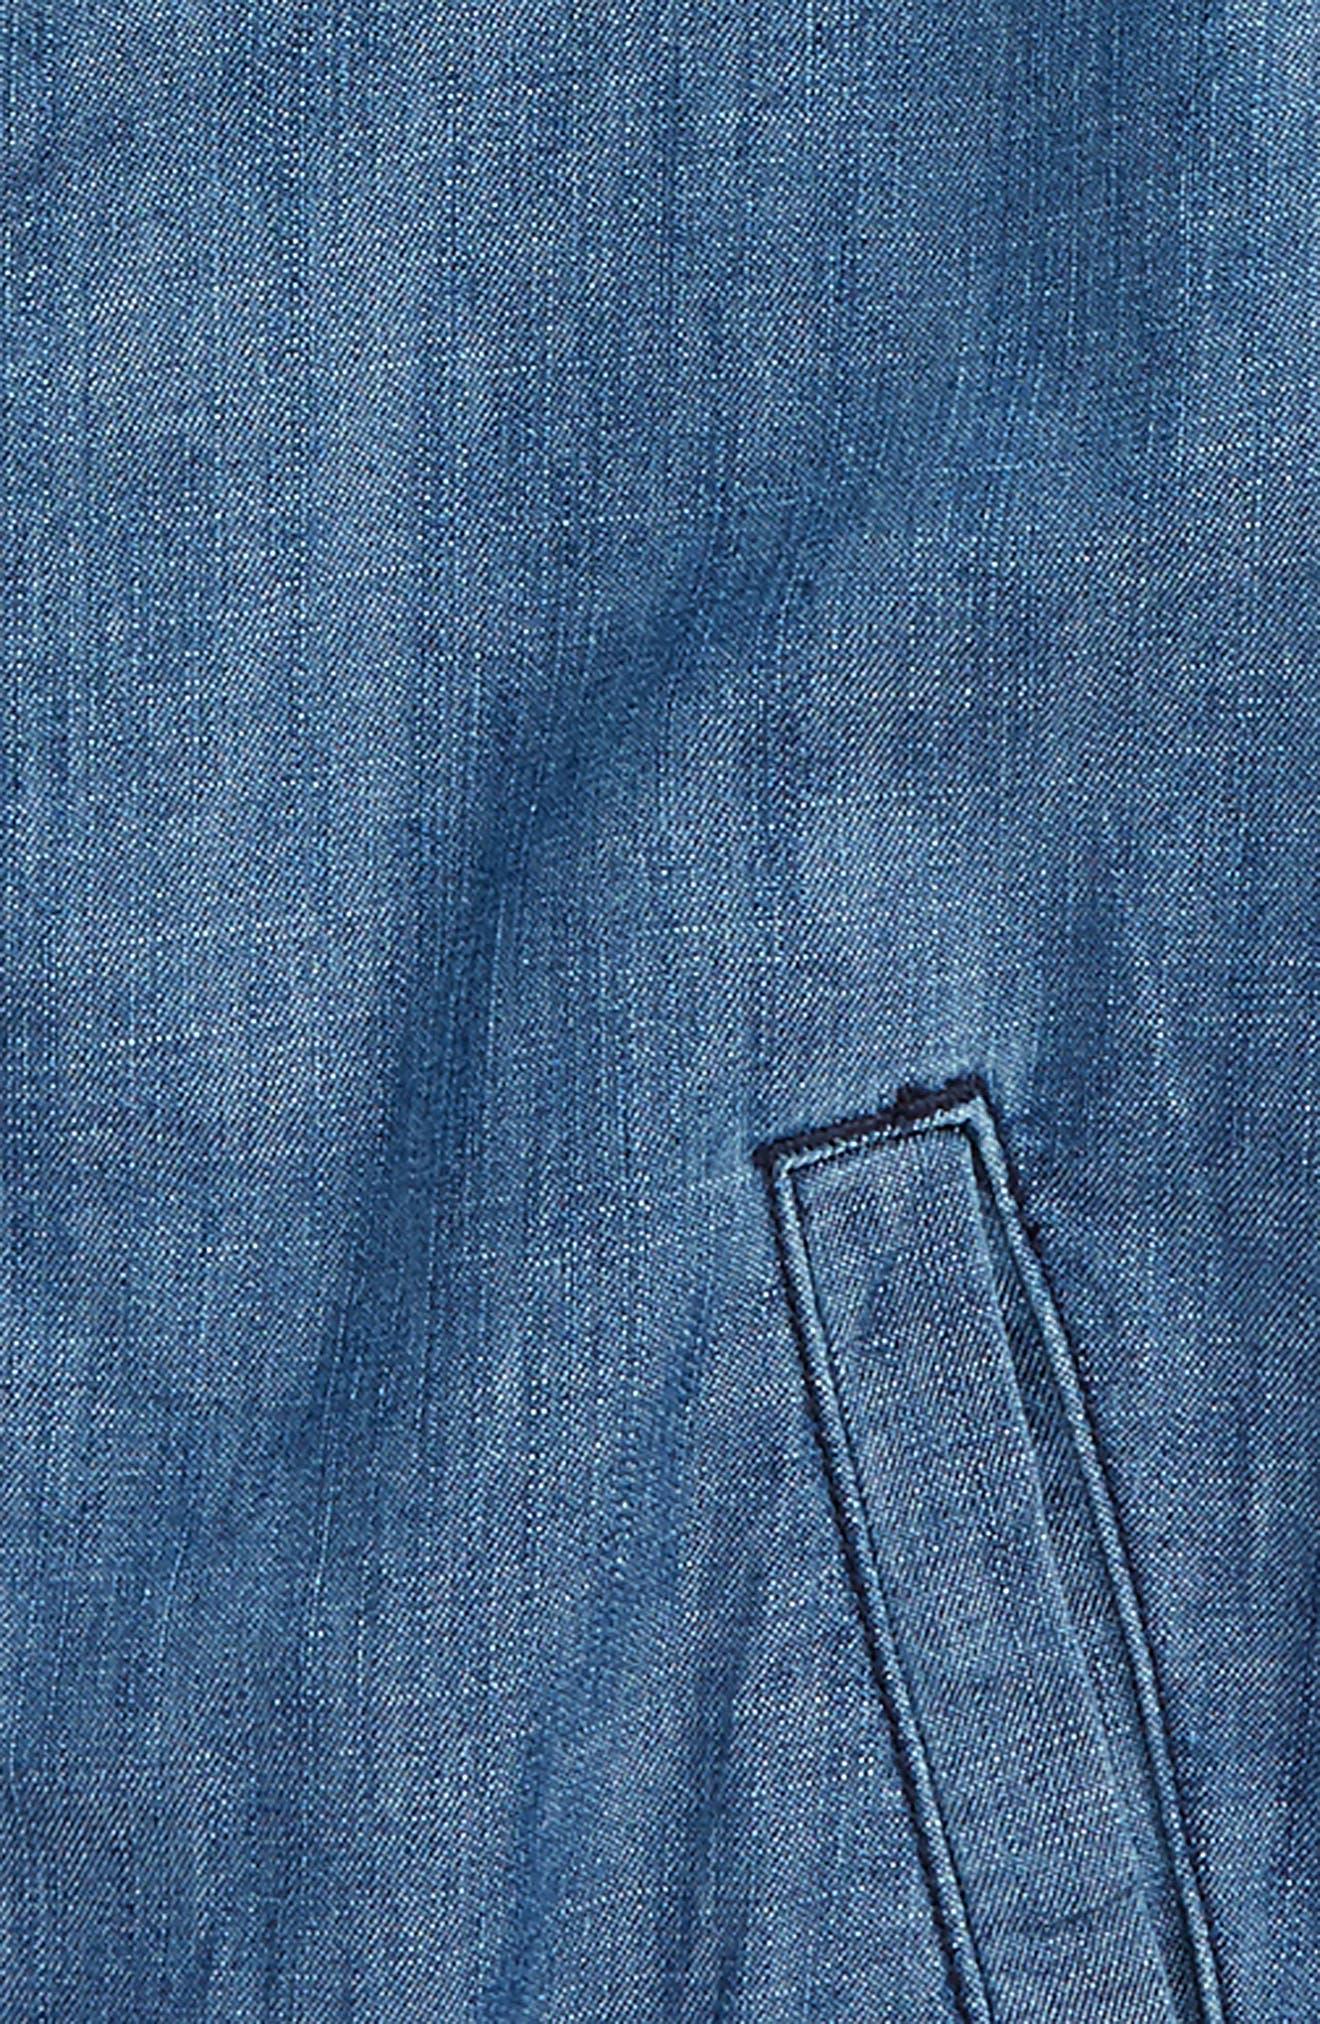 Denim Bomber Jacket,                             Alternate thumbnail 2, color,                             Dusk Blue Wash